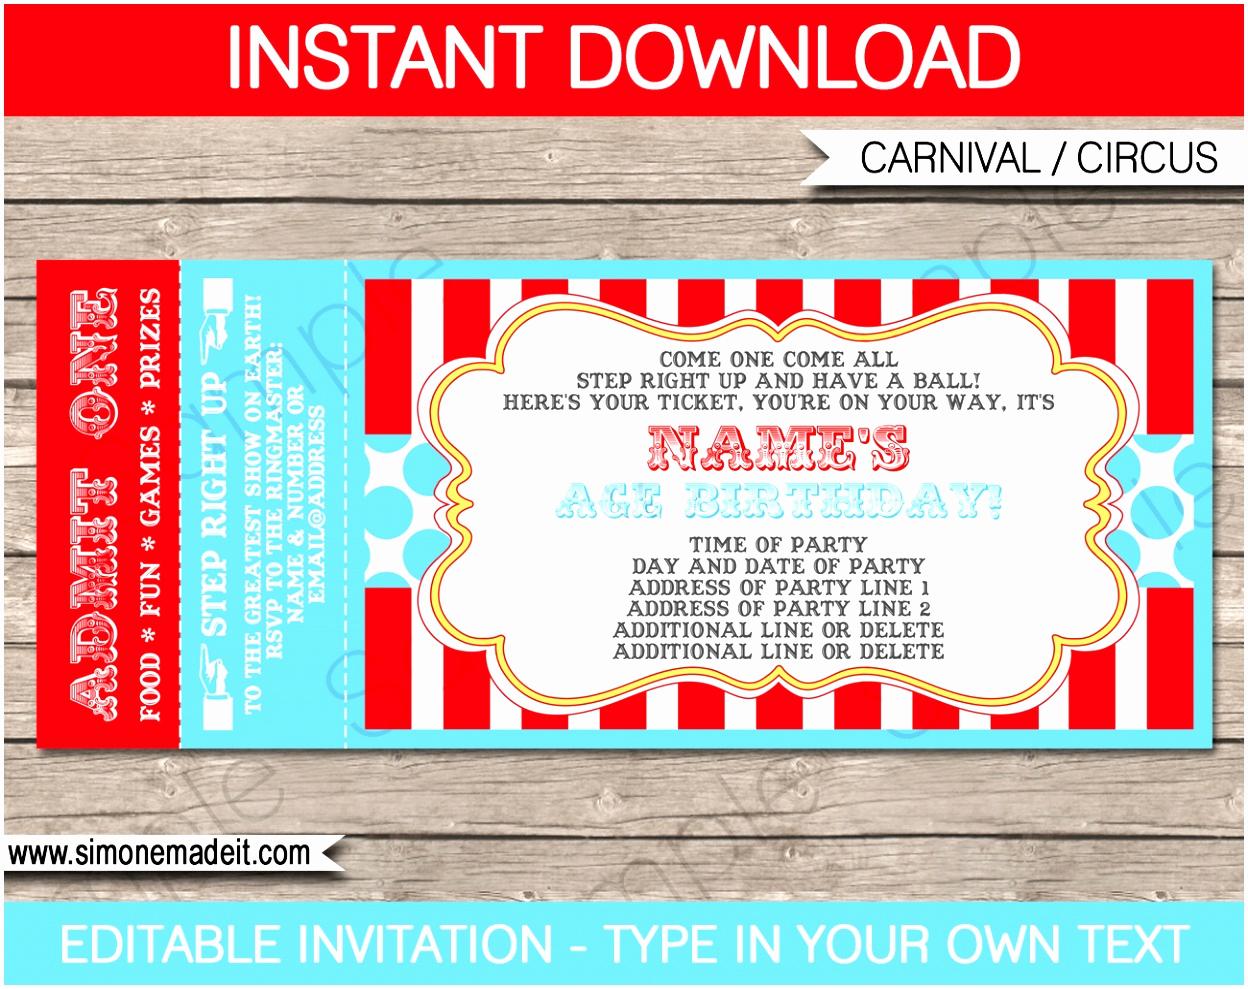 Circus Ticket Invitation Template Free Unique 12 Carnival Ticket Invitation Template Prwtv